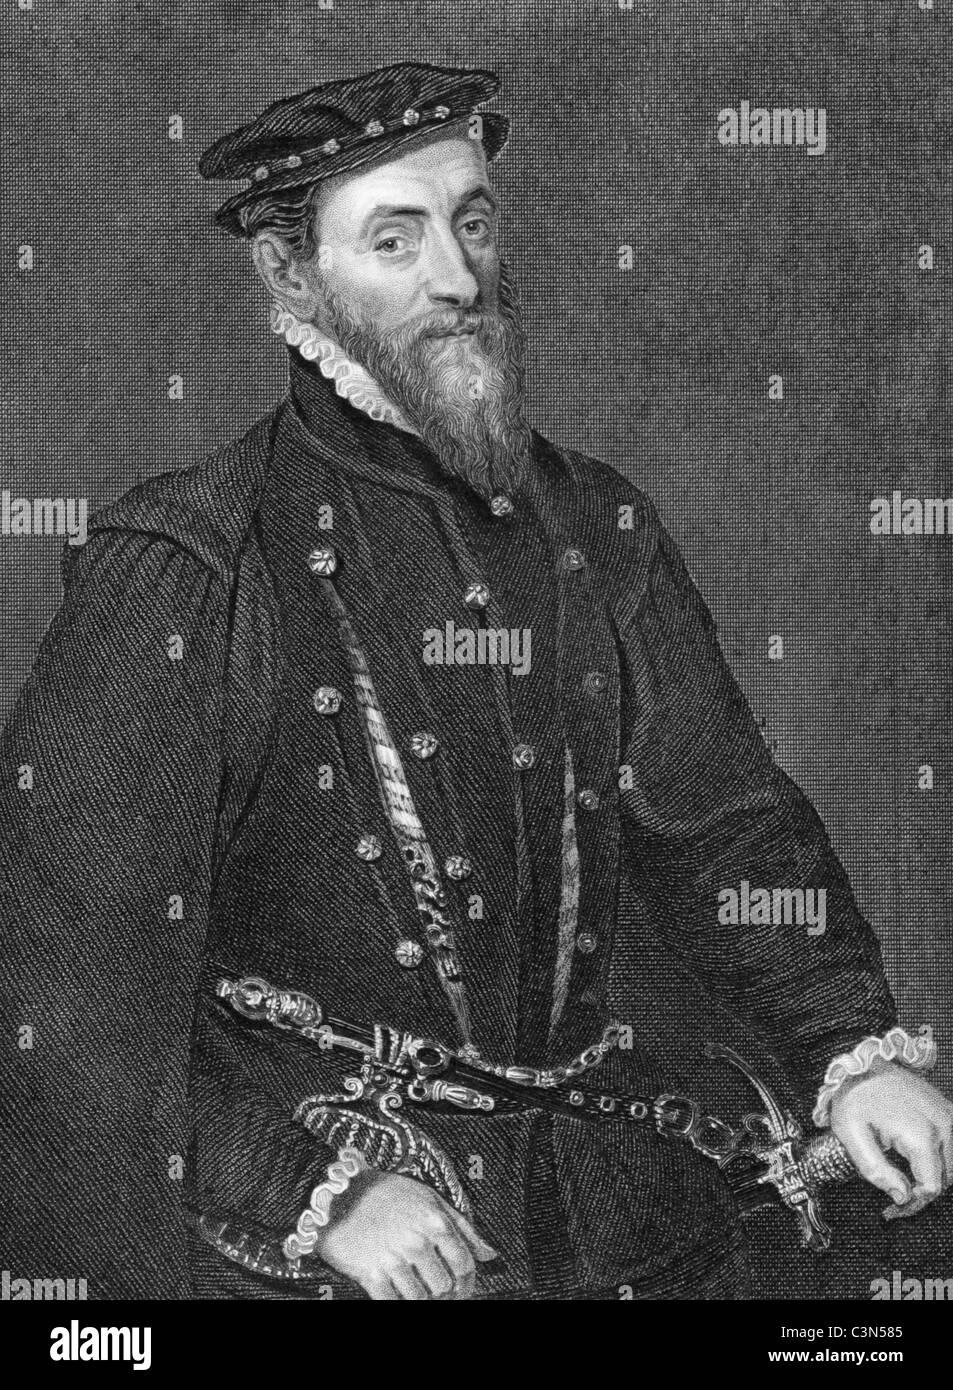 Thomas Gresham (1519-1579) on engraving from 1838. English merchant and financier. - Stock Image